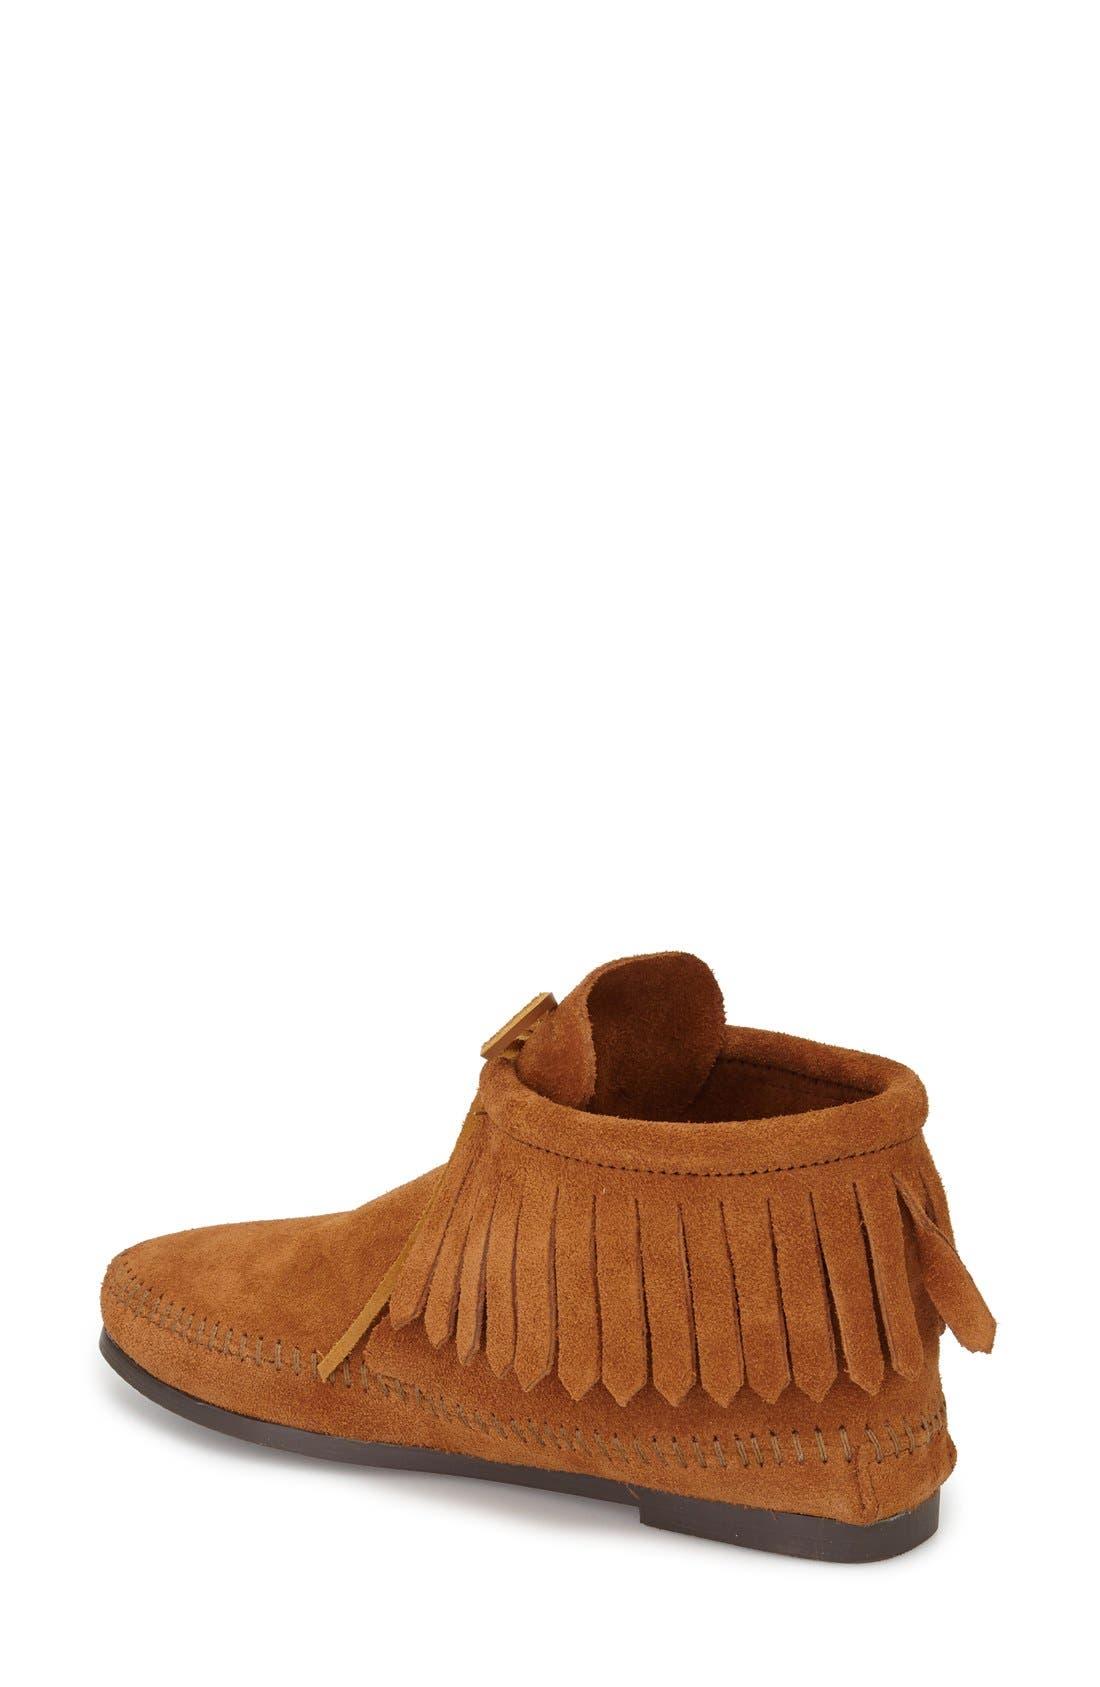 MINNETONKA, Classic Fringed Chukka Style Boot, Alternate thumbnail 2, color, BROWN